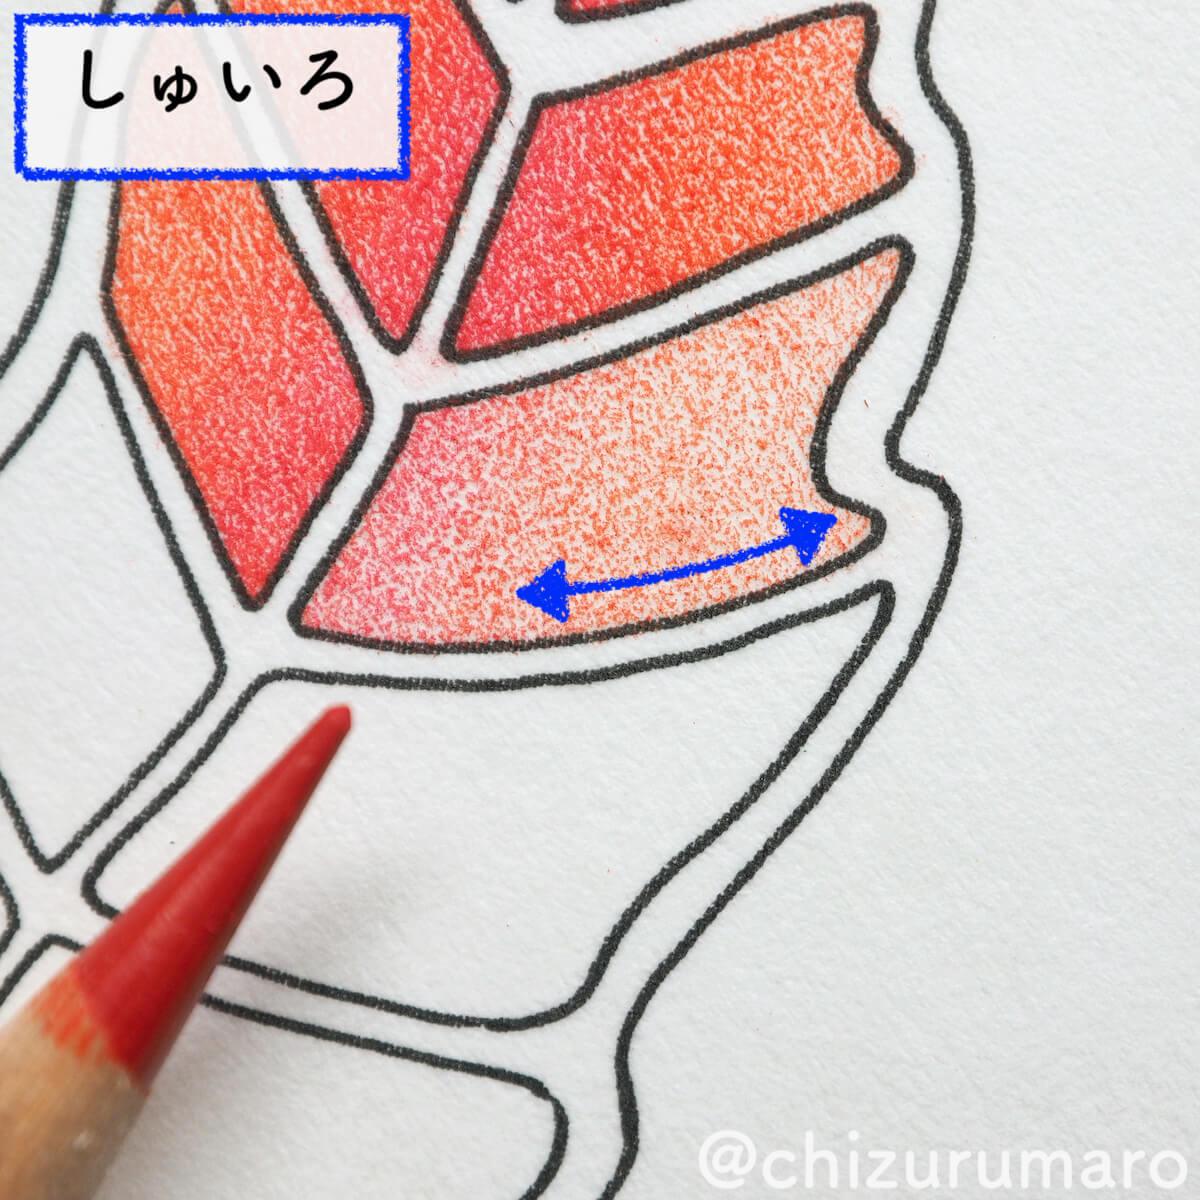 f:id:chizurumaro:20200603122152j:plain